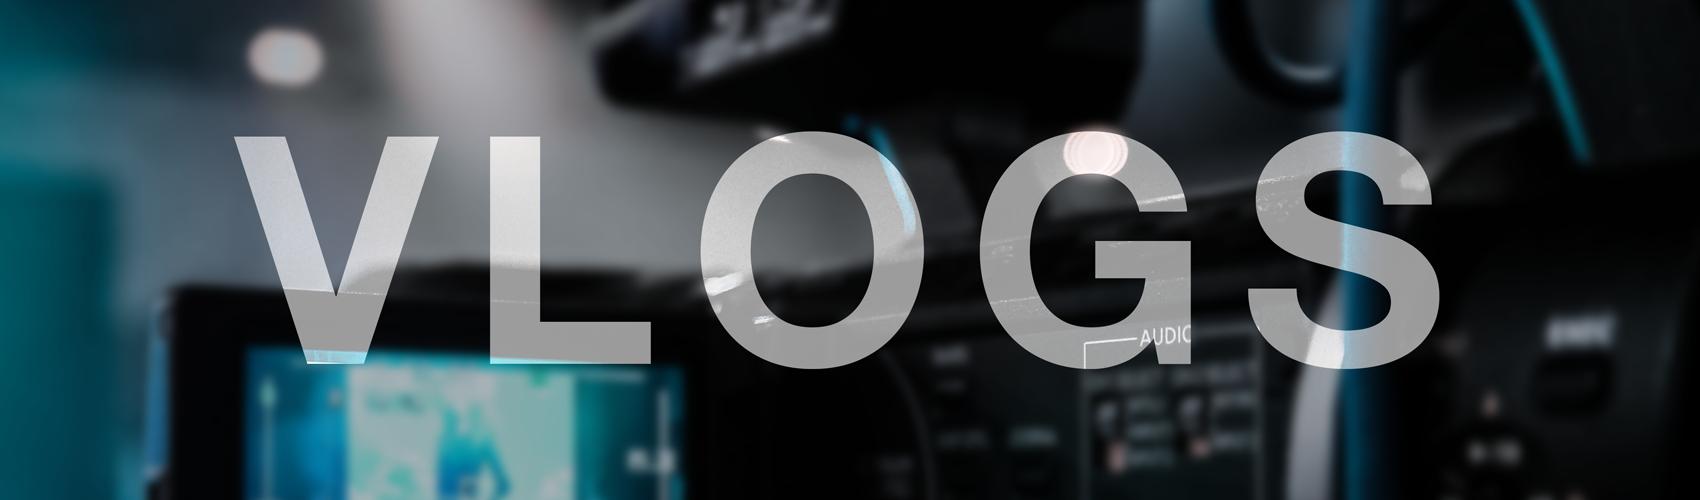 Vlogs_BANNER1.png